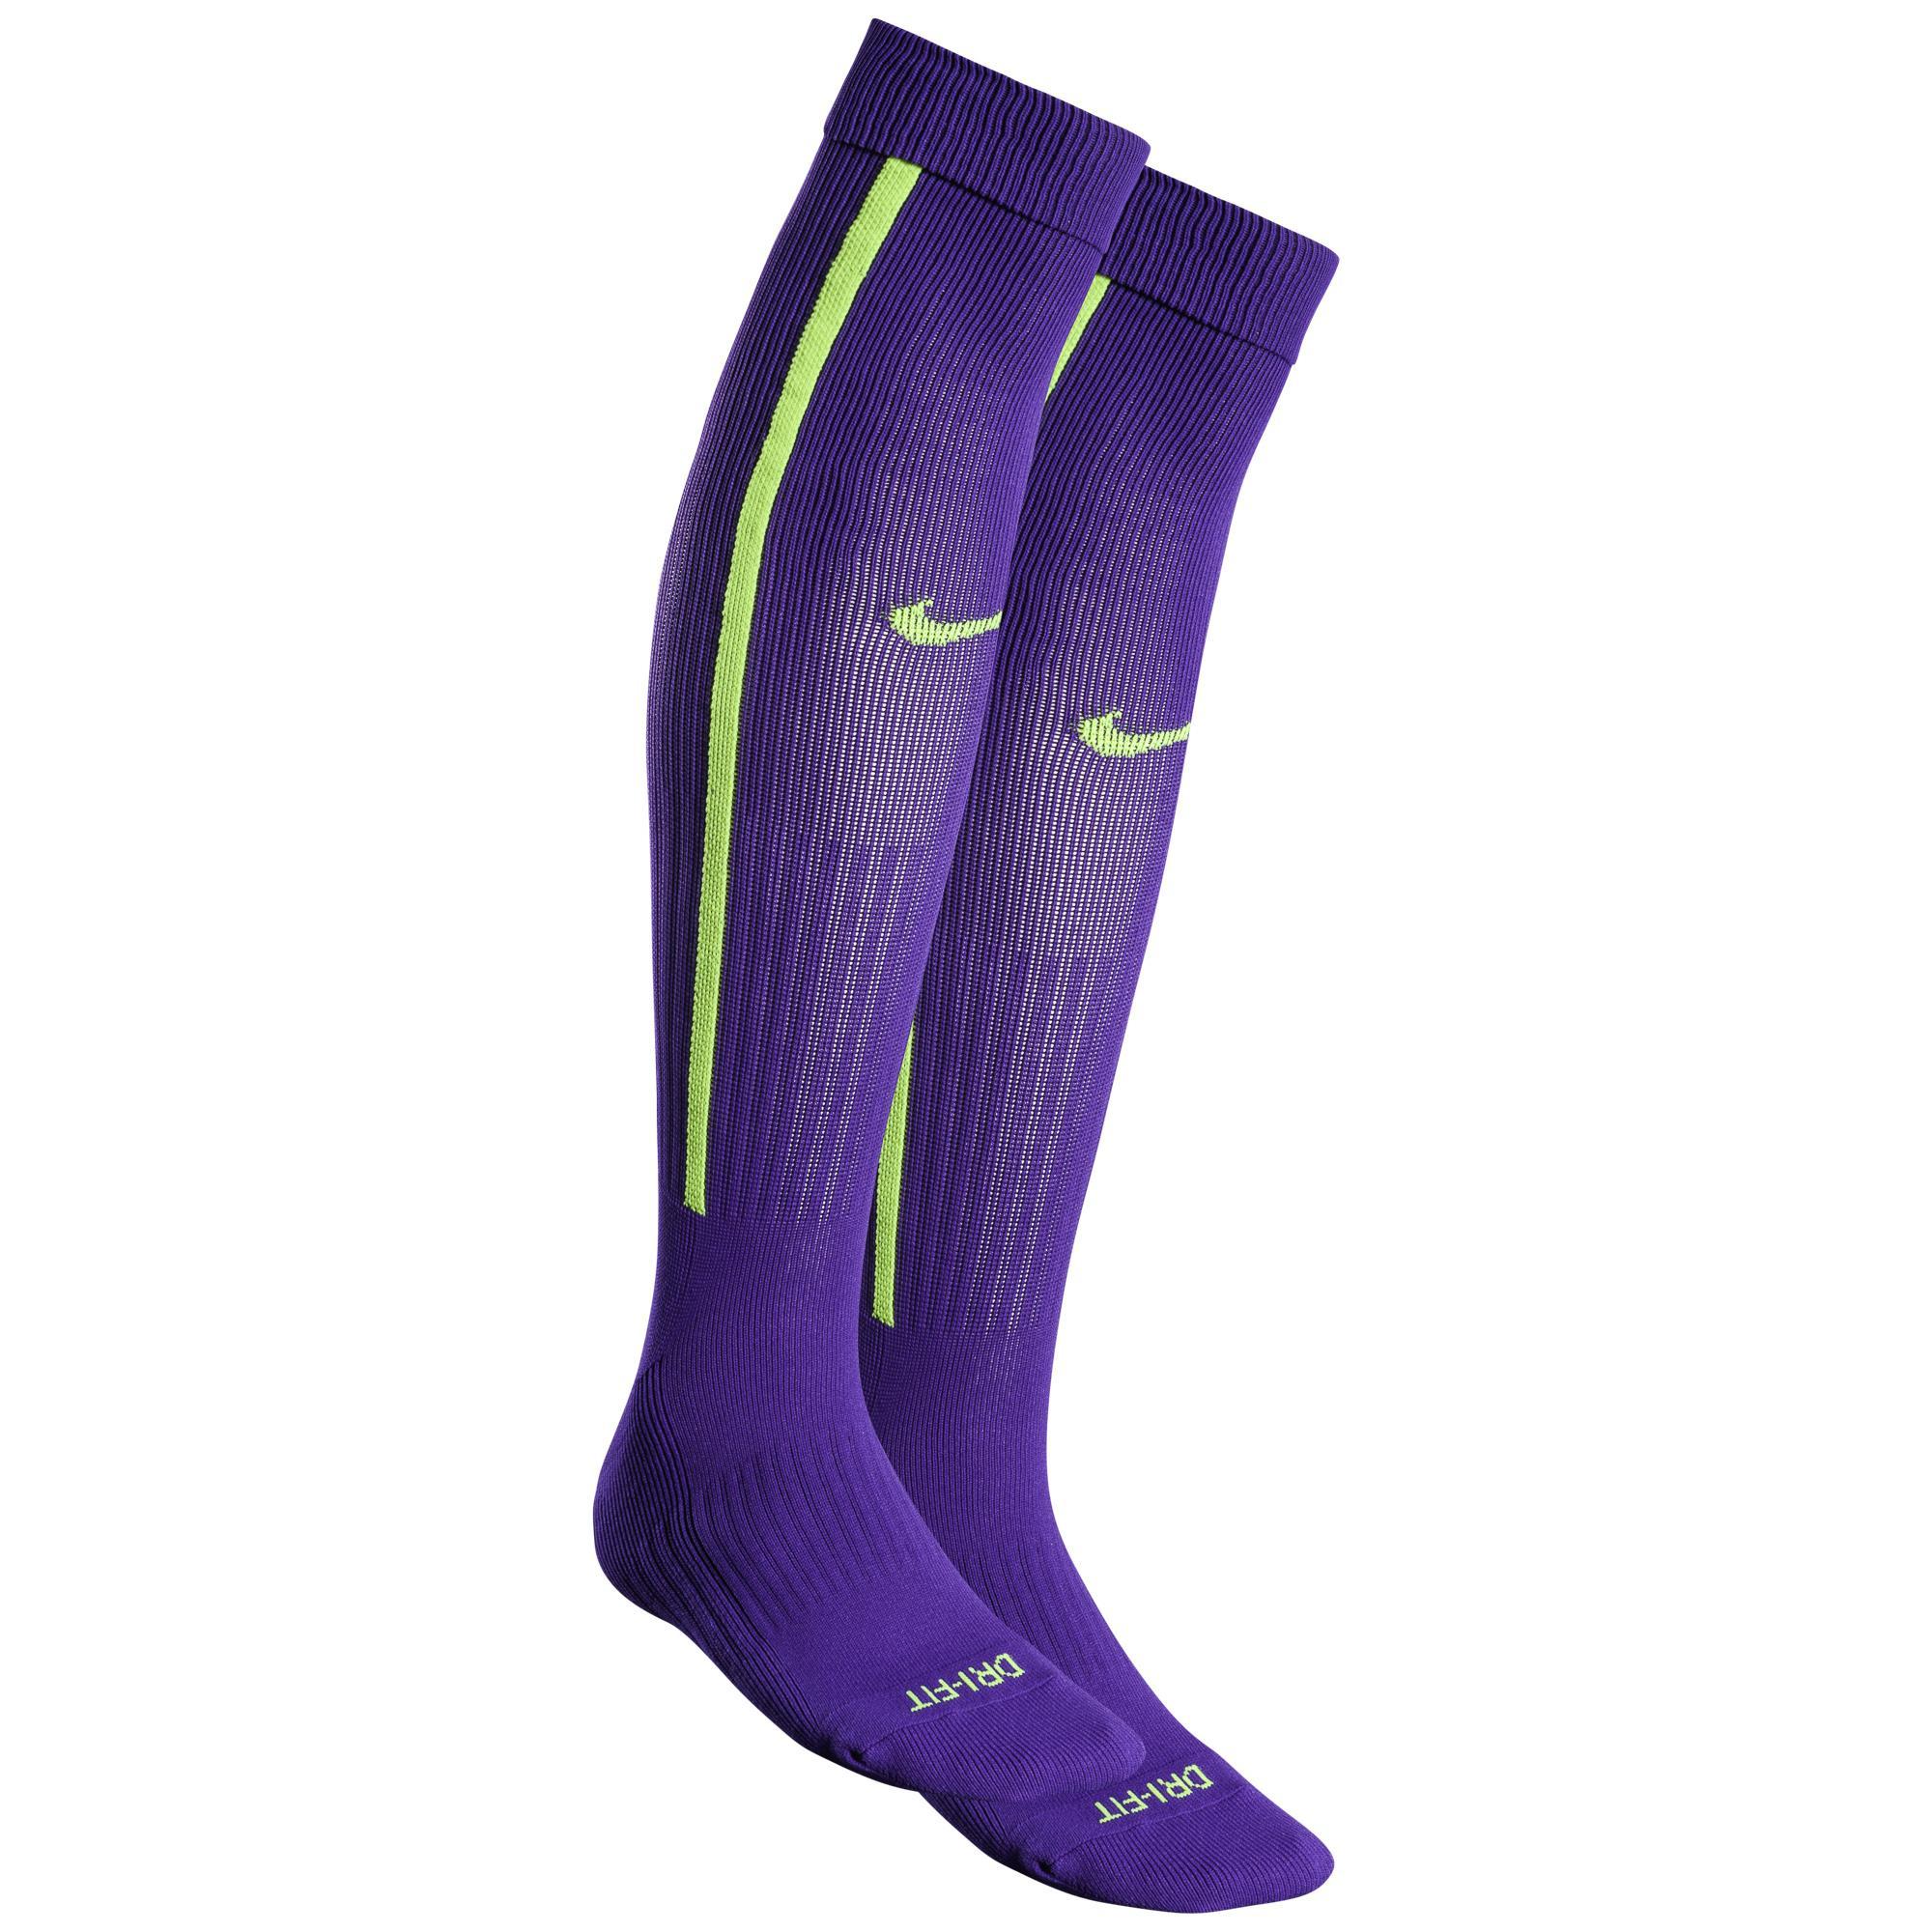 Nike Fotbollsstrumpor Vapor III Lila/Neon